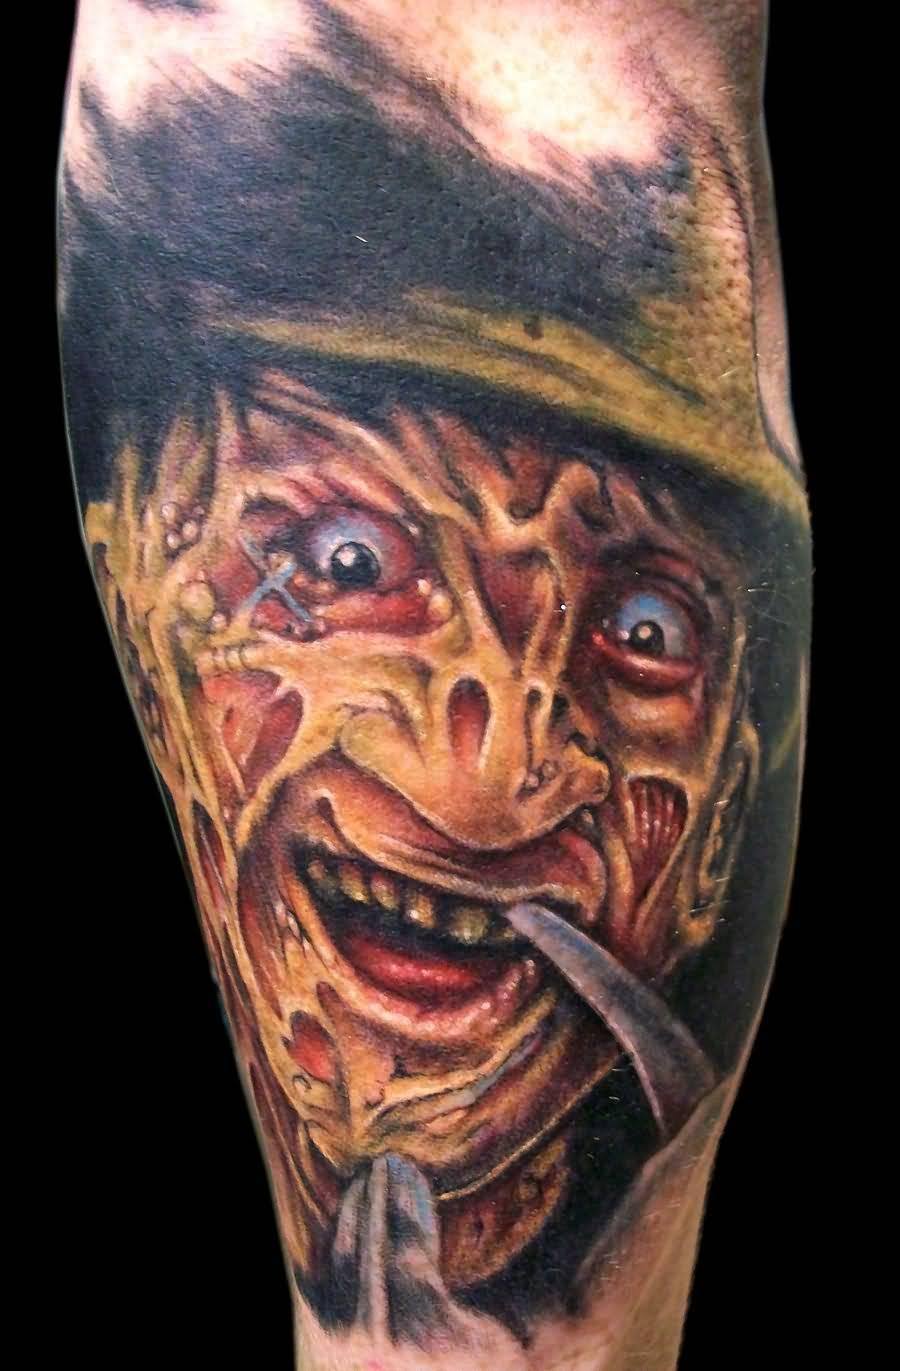 bf9bba60b Amazing Freddy Krueger Head Portrait Color Tattoo By TechniquesArt